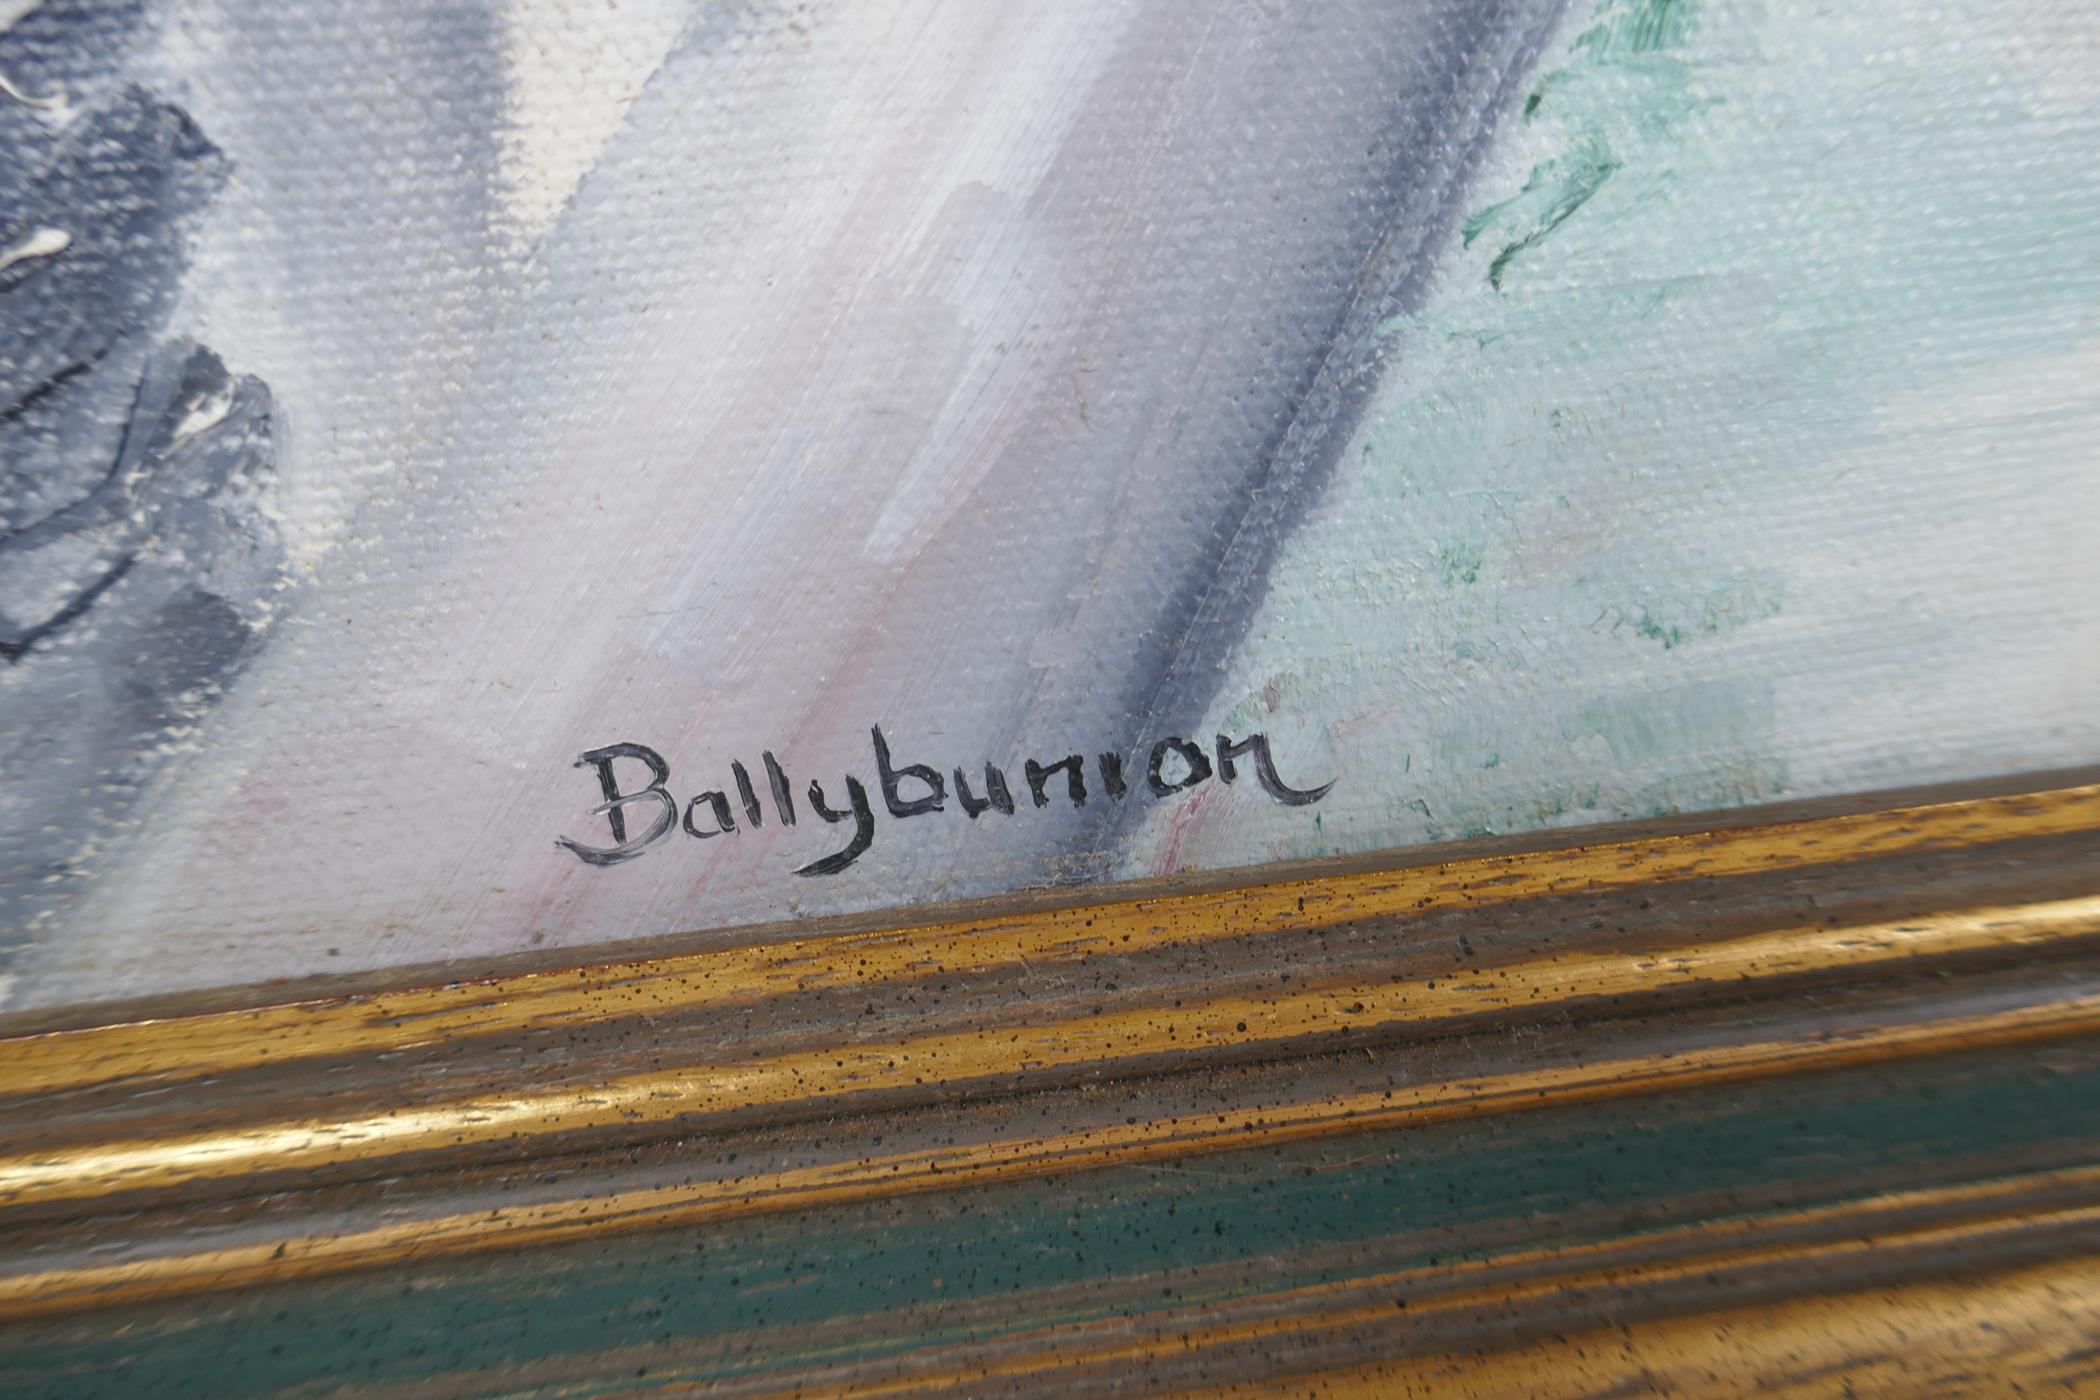 "Anne O' Hara, Irish coastal landscape, titled 'Ballybunion', signed, oil on canvas, 30"" x 18"" - Image 4 of 5"